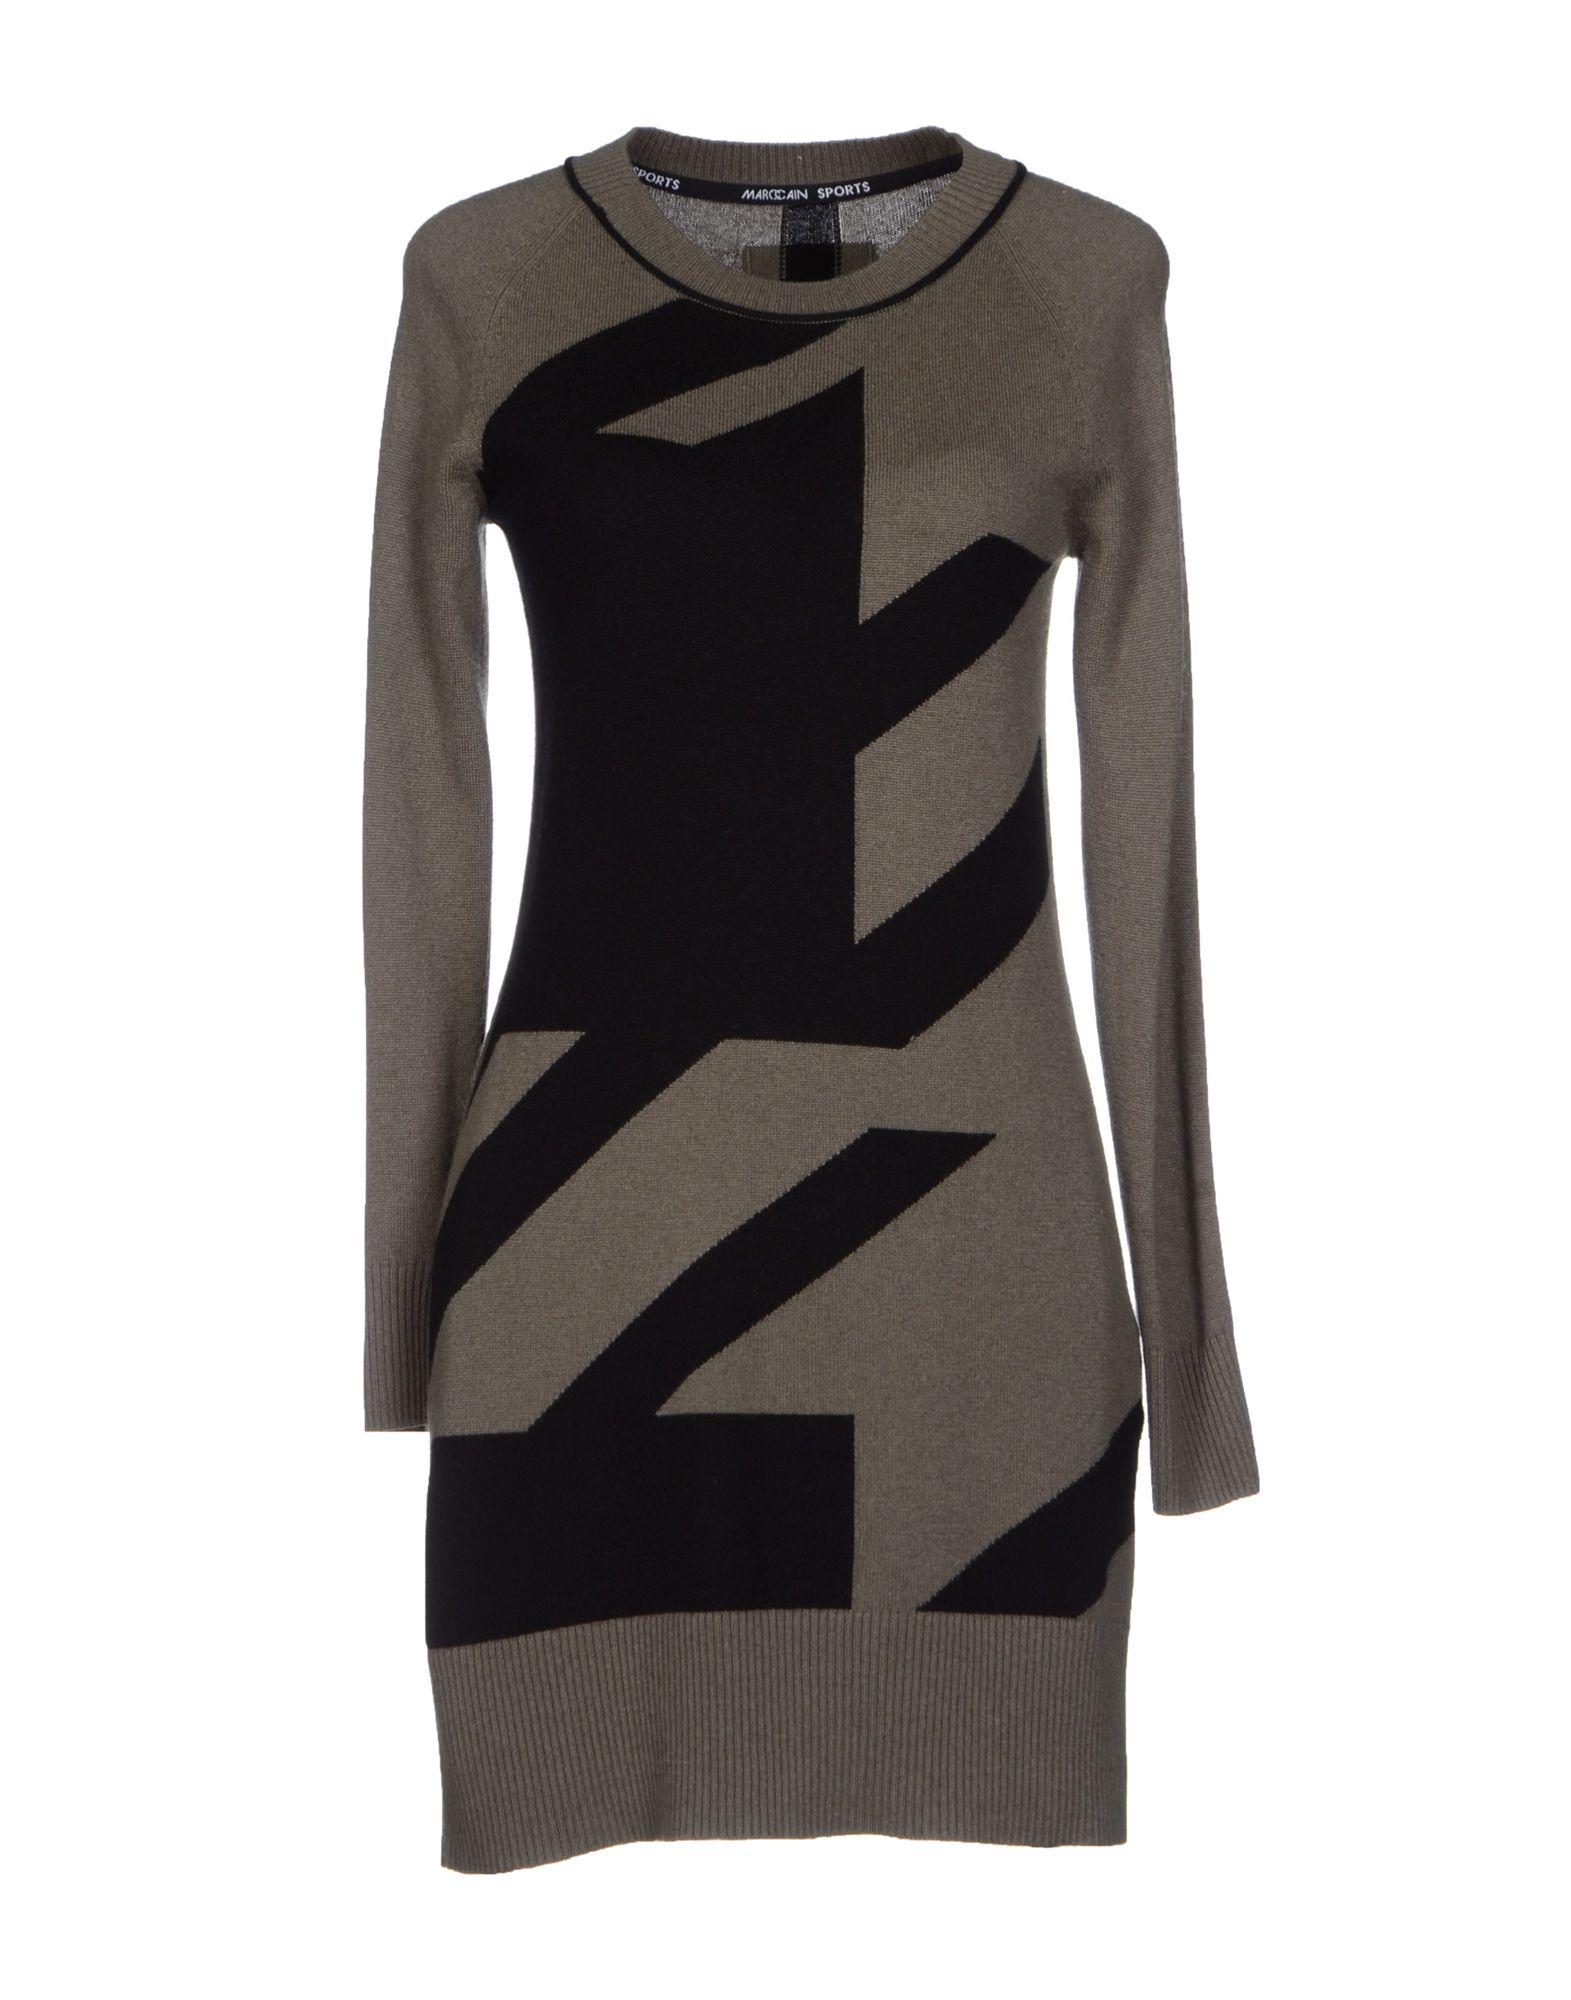 neueste elegant im Stil am besten online Marc Cain Sports Short Dress Women Marc Cain Sports Short ...